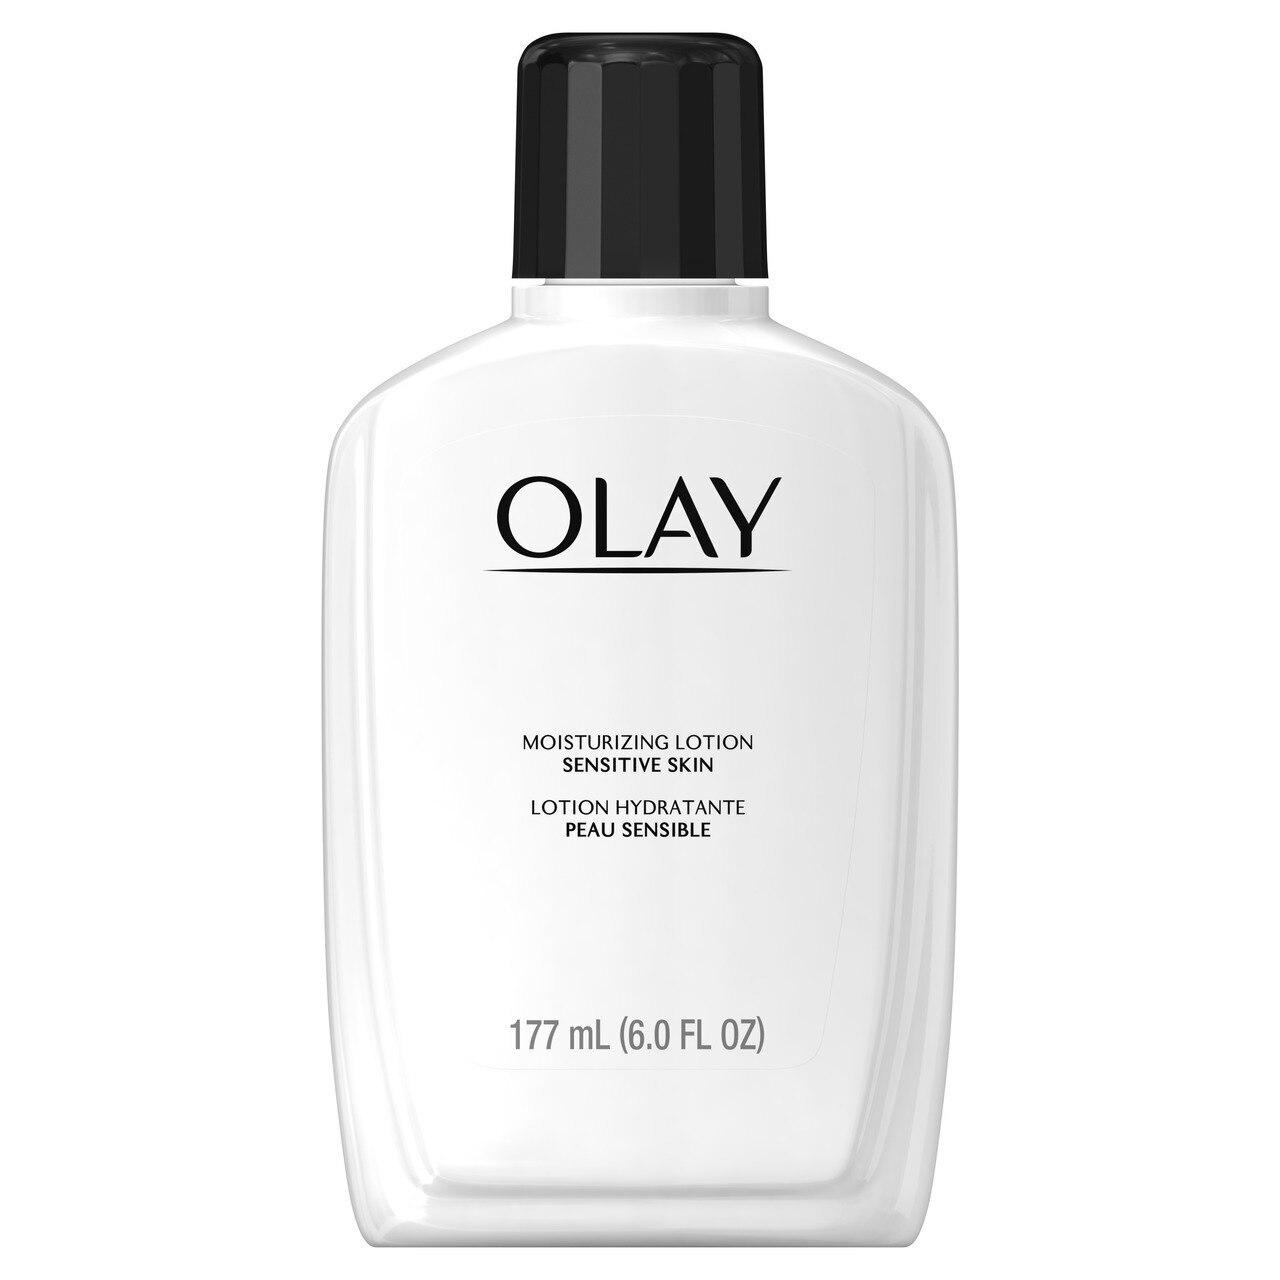 Olay | Moisturizing Face Lotion | Sensitive Skin